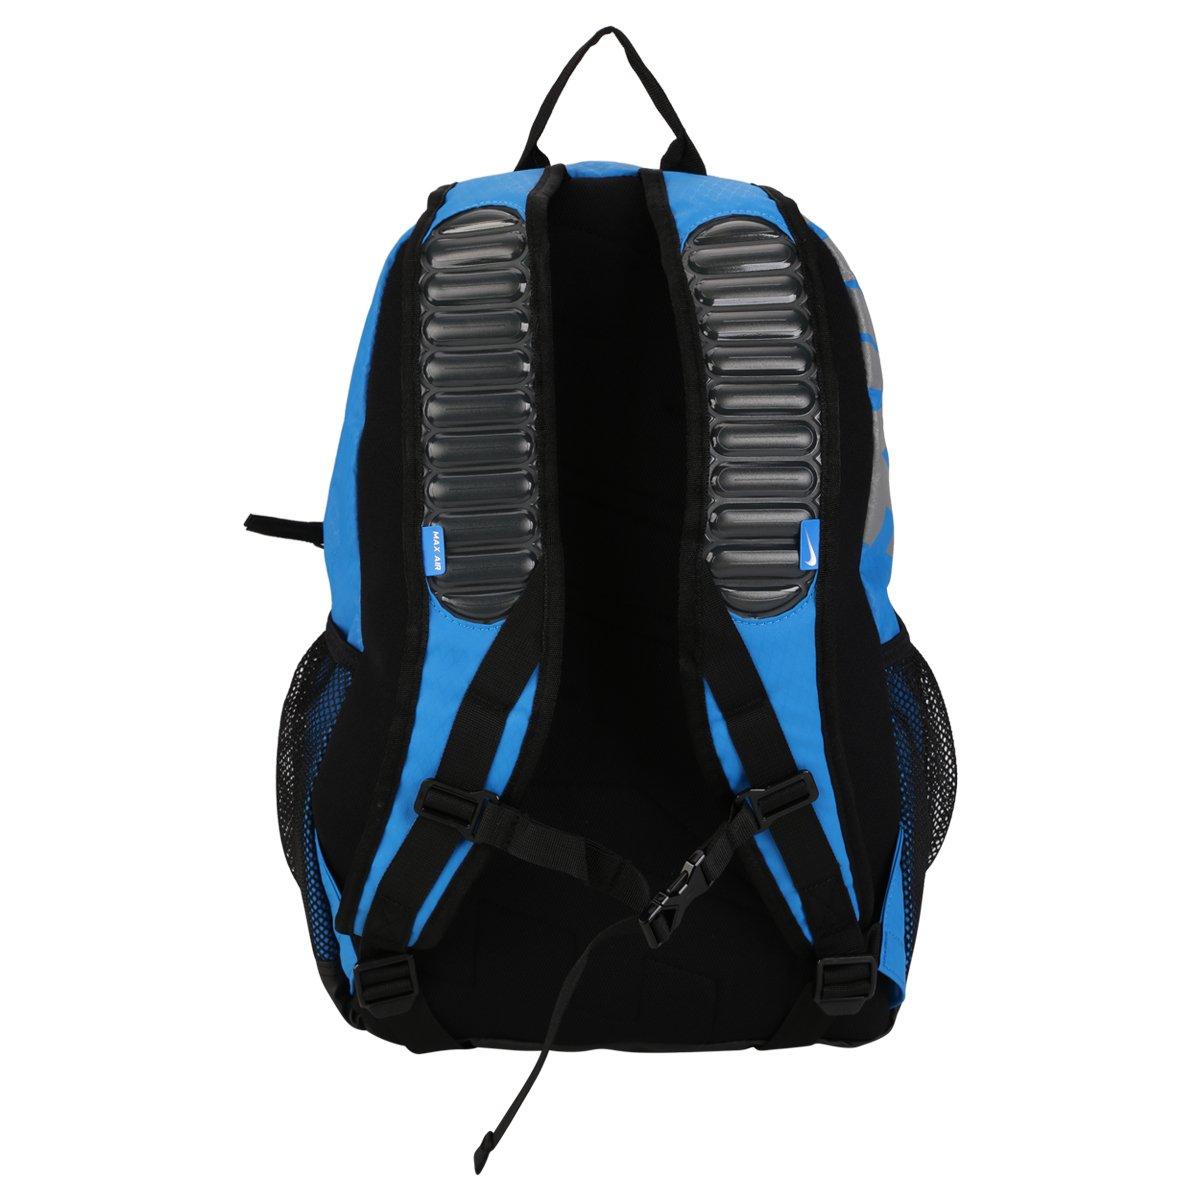 Vapor Mochila Air Netshoes Agora Compre Nike Max qttxrga